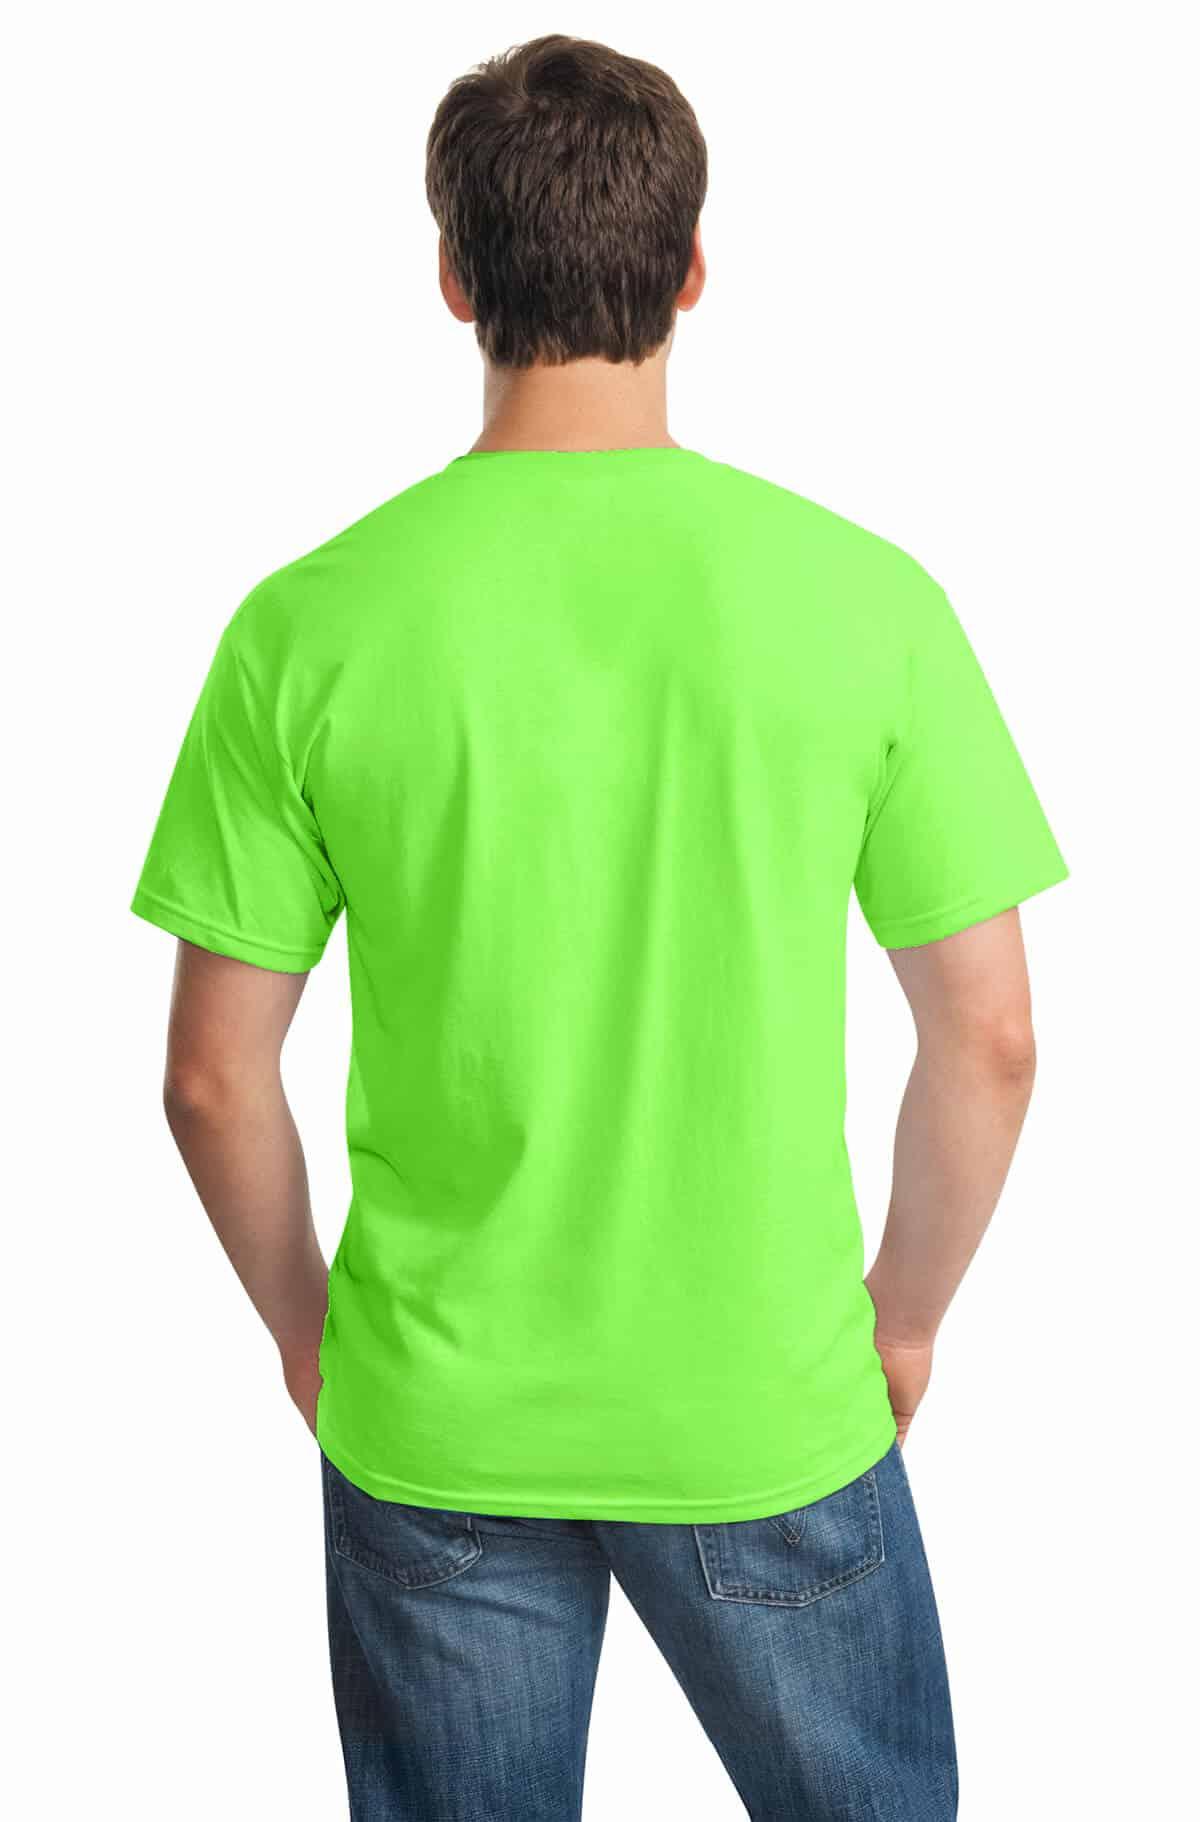 Neon Green Tee Back